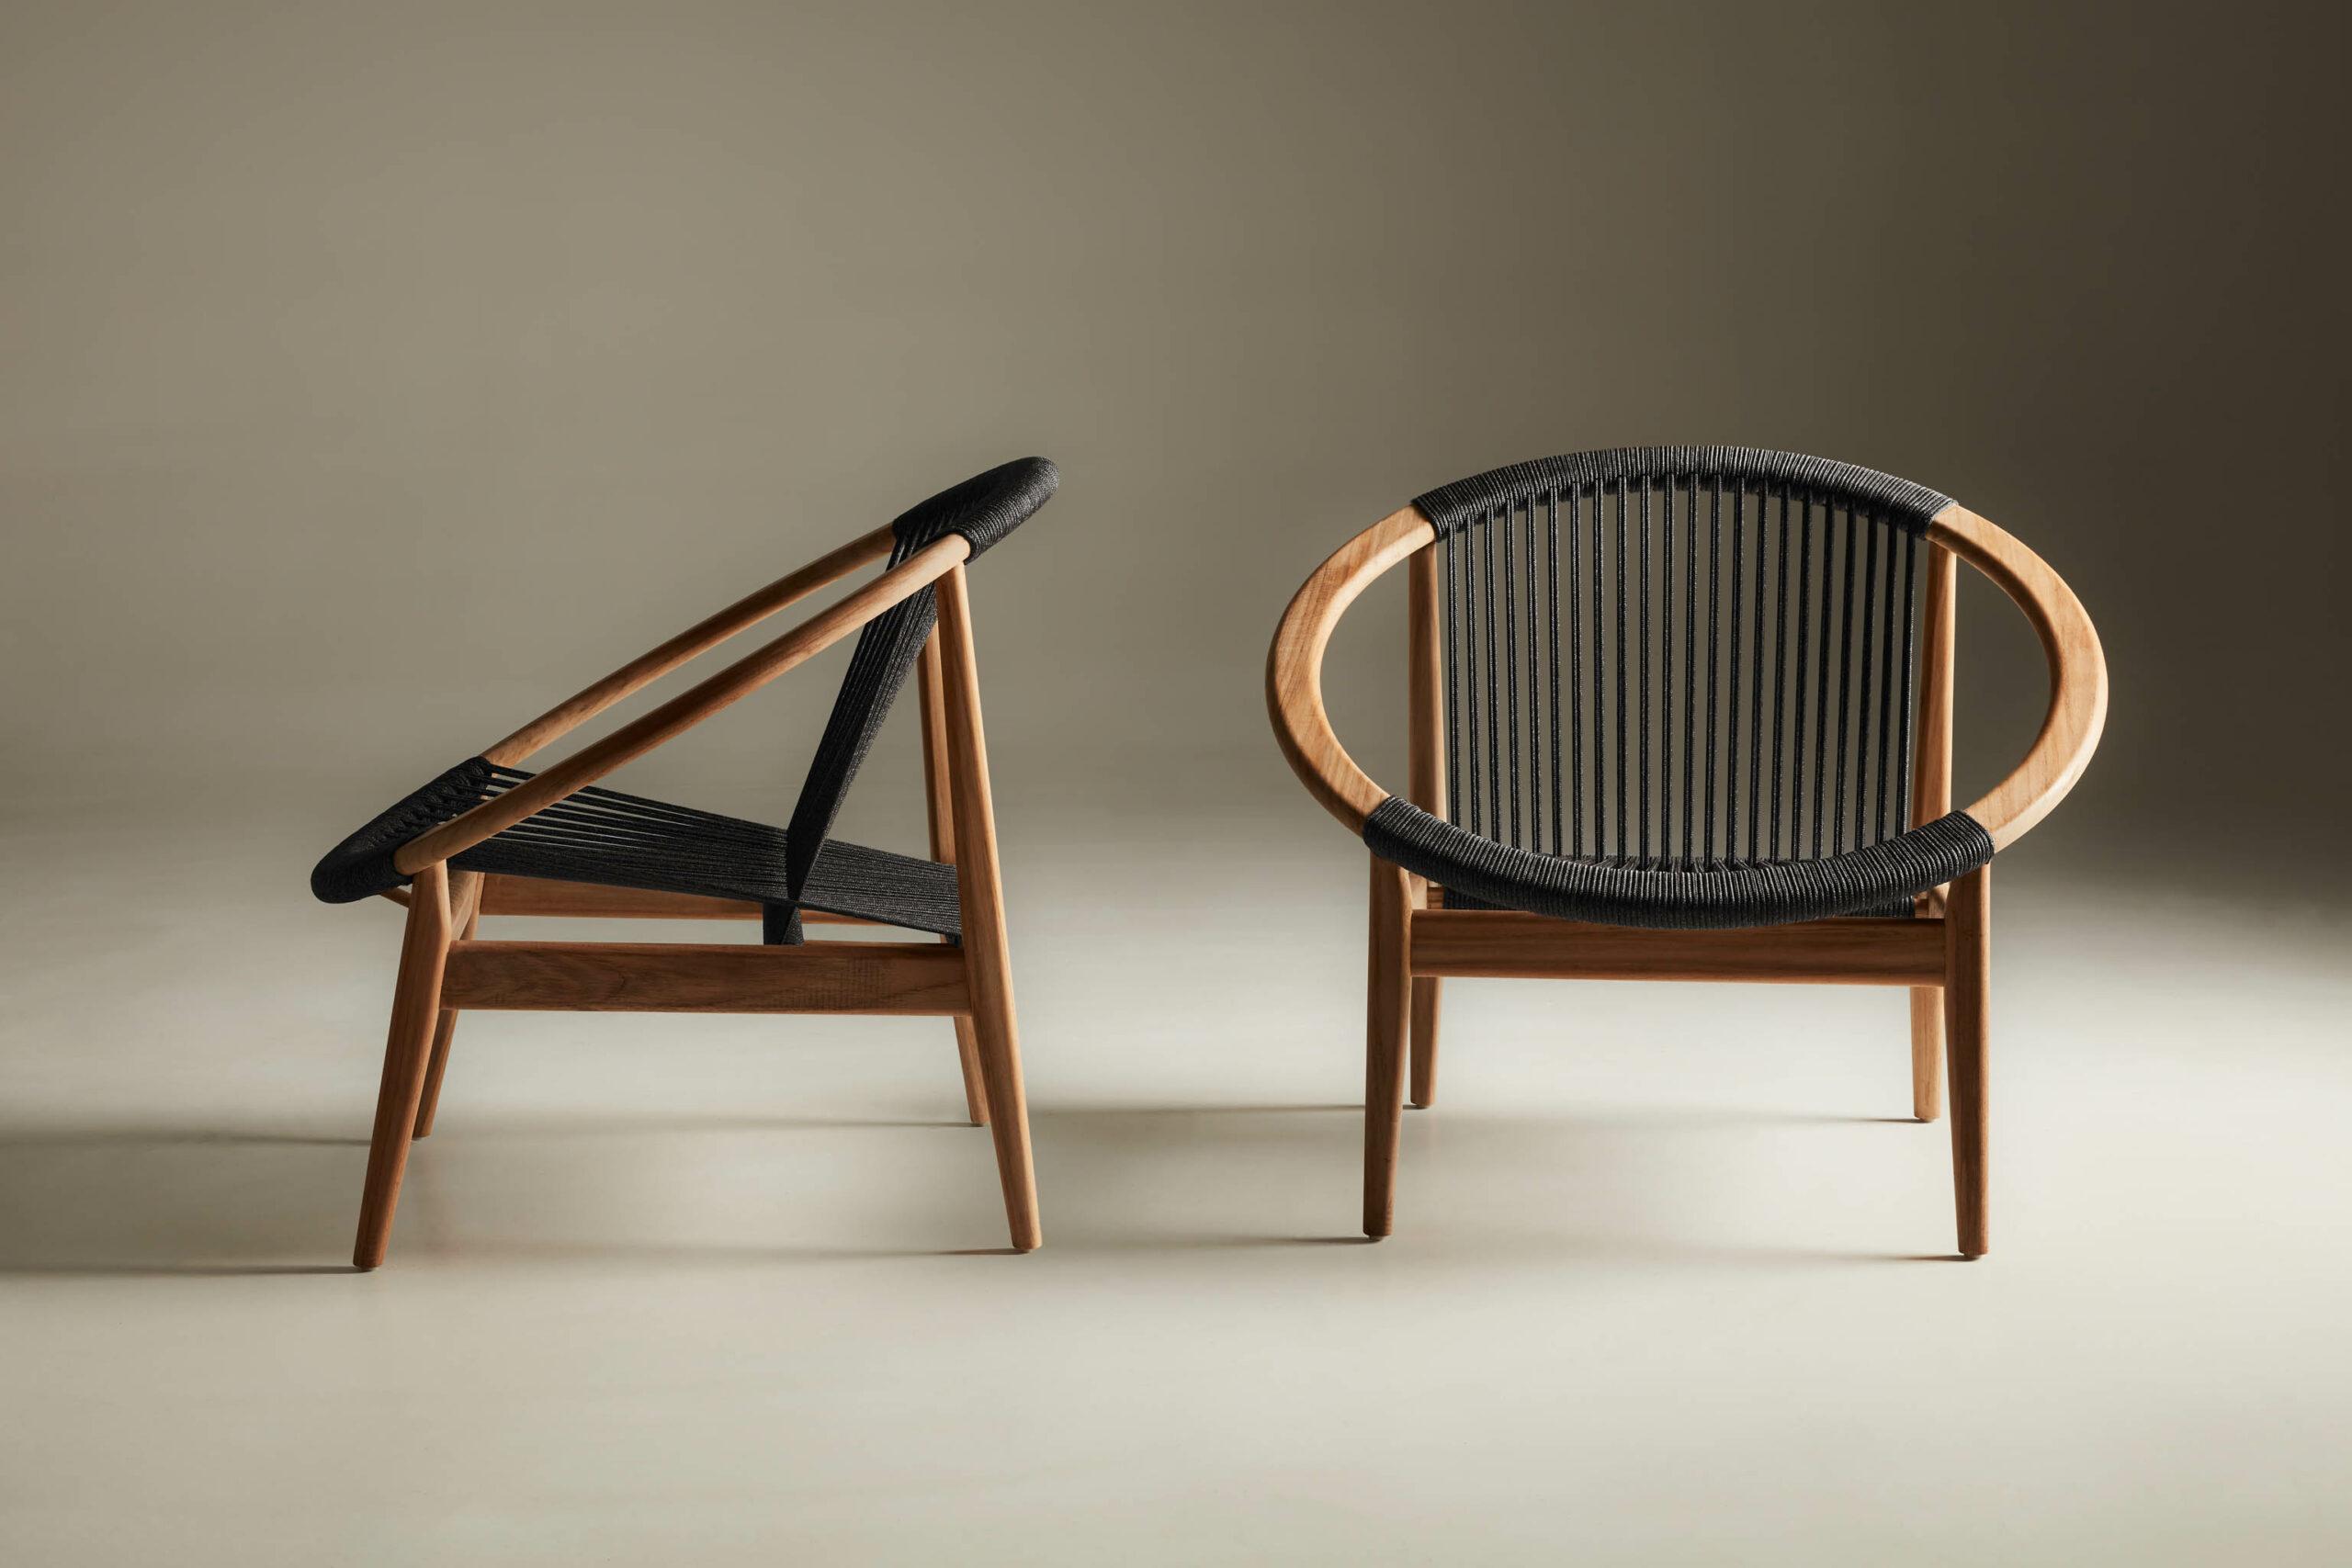 Vincent_Sheppard_Frida_lounge_chair